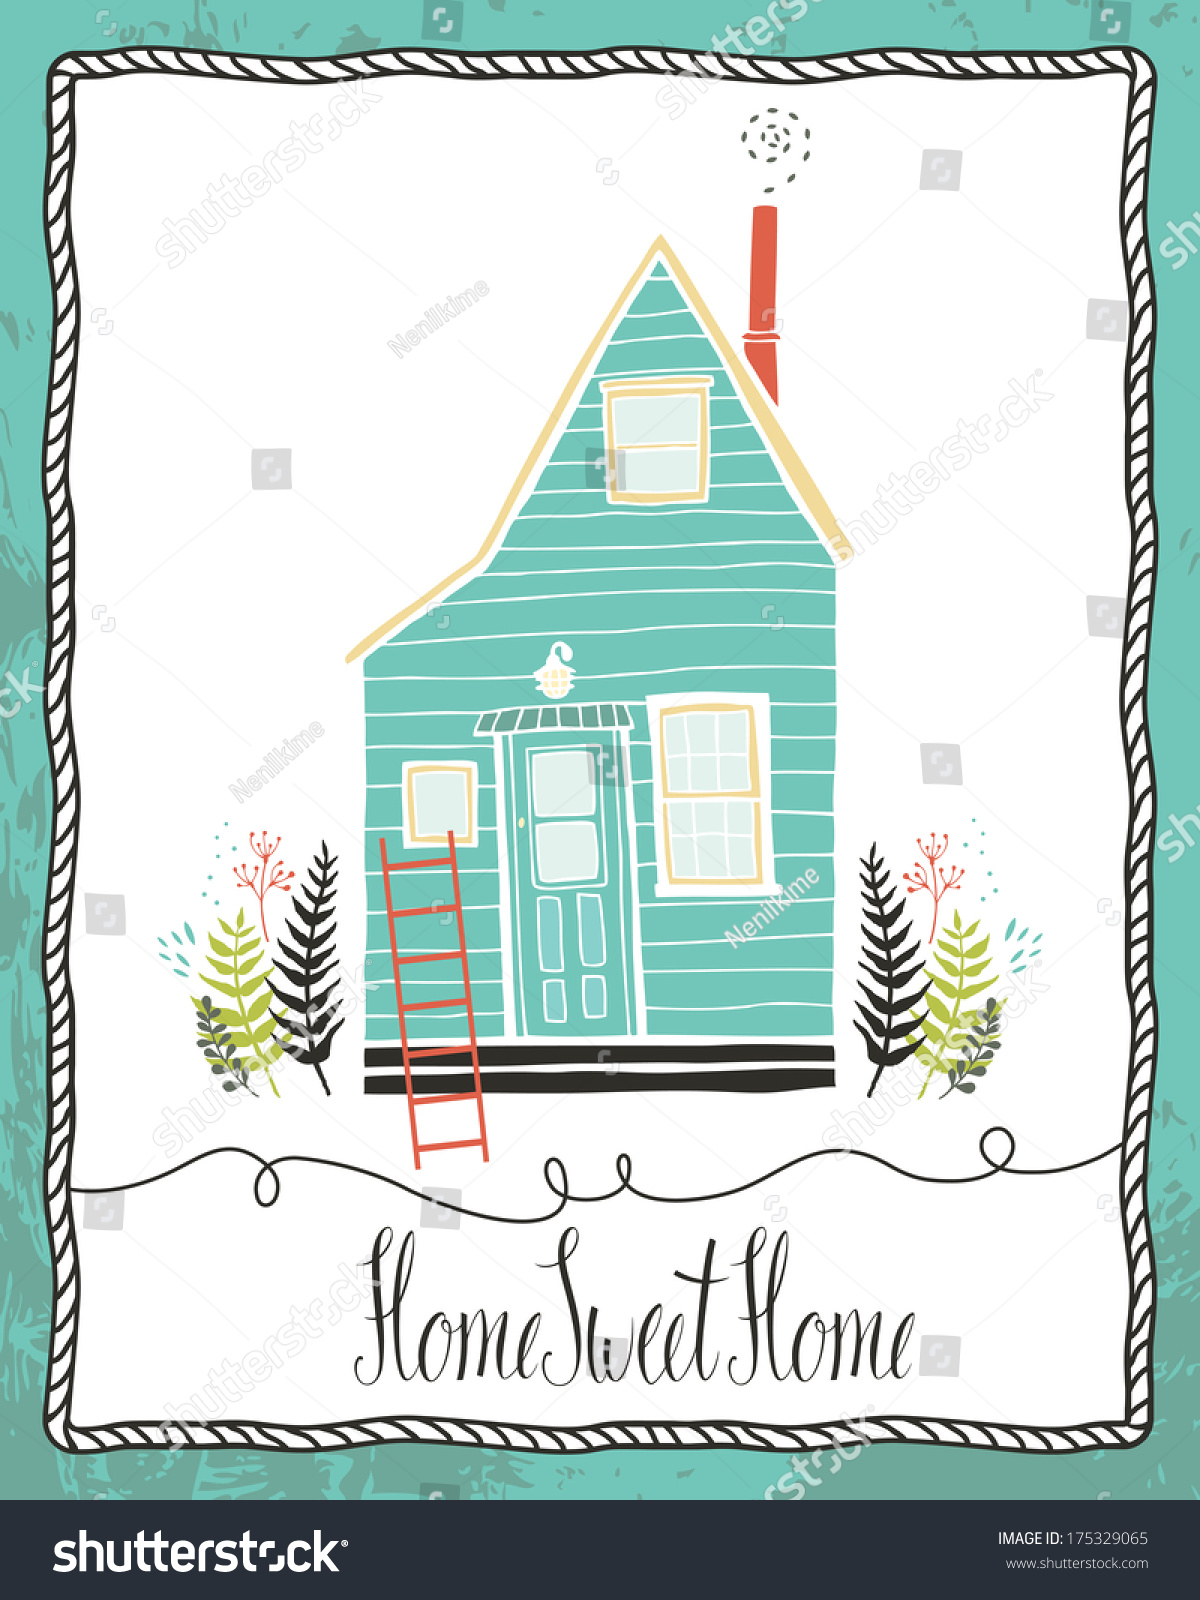 home design card. Home sweet home design card Sweet Design Card Stock Vector 175329065  Shutterstock